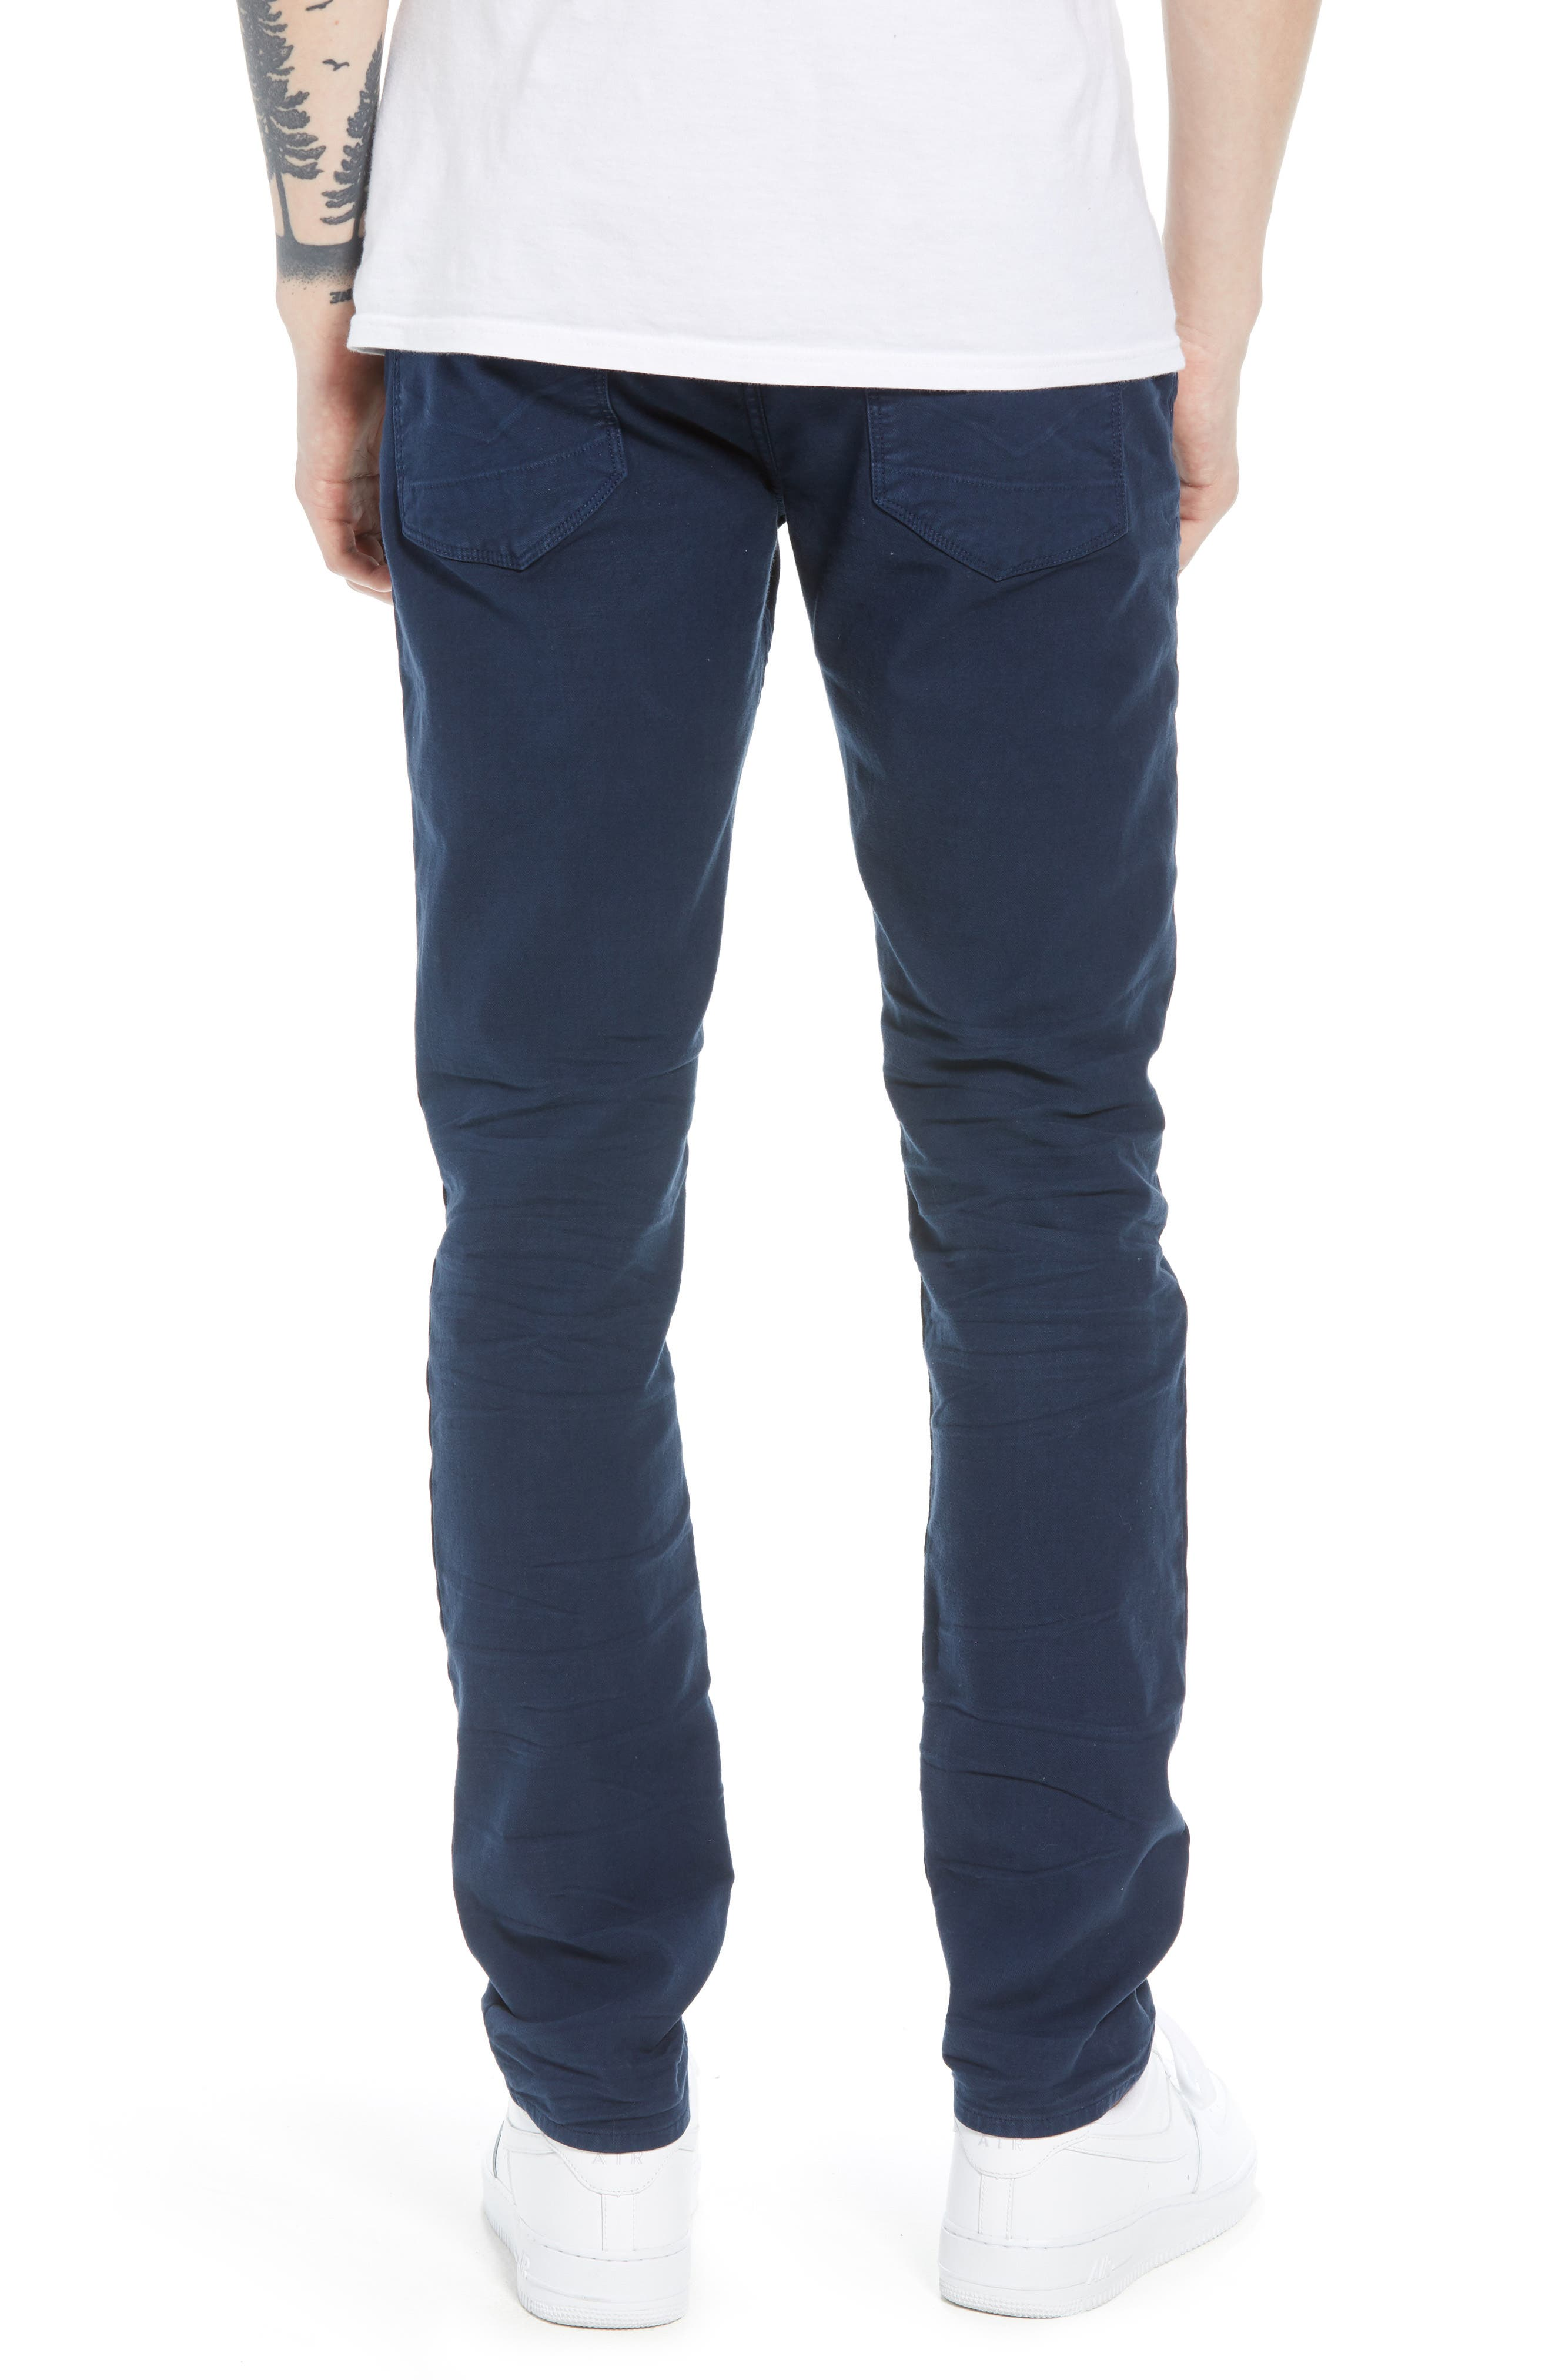 HUDSON JEANS, Axl Skinny Fit Jeans, Alternate thumbnail 2, color, SAILOR BLUE